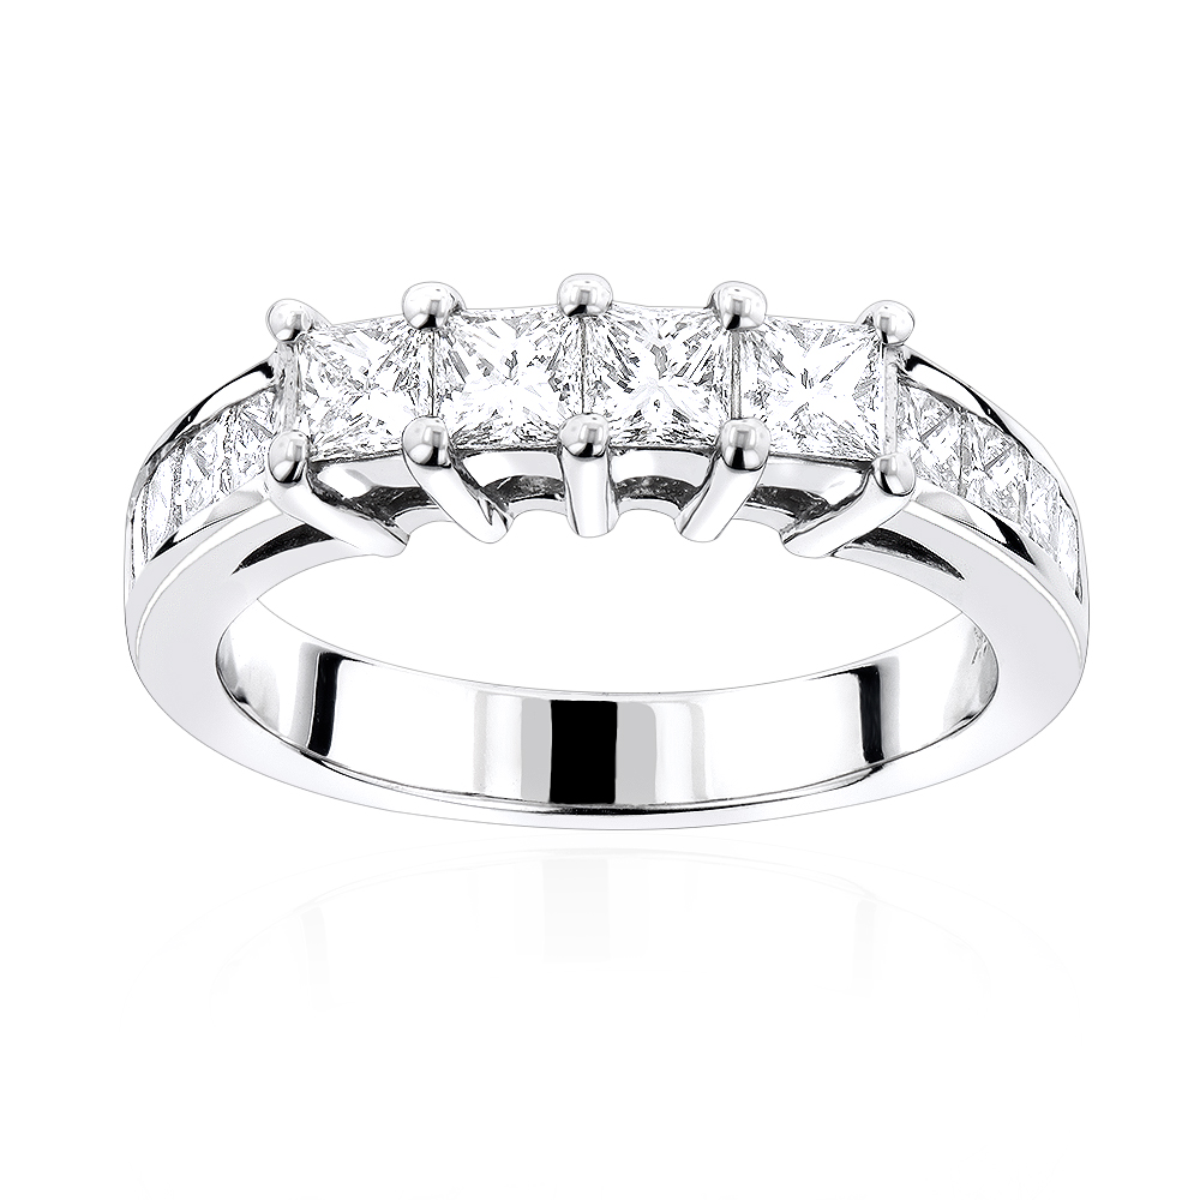 14K Gold Princess Cut Diamond Wedding Band for Women 1.85ct